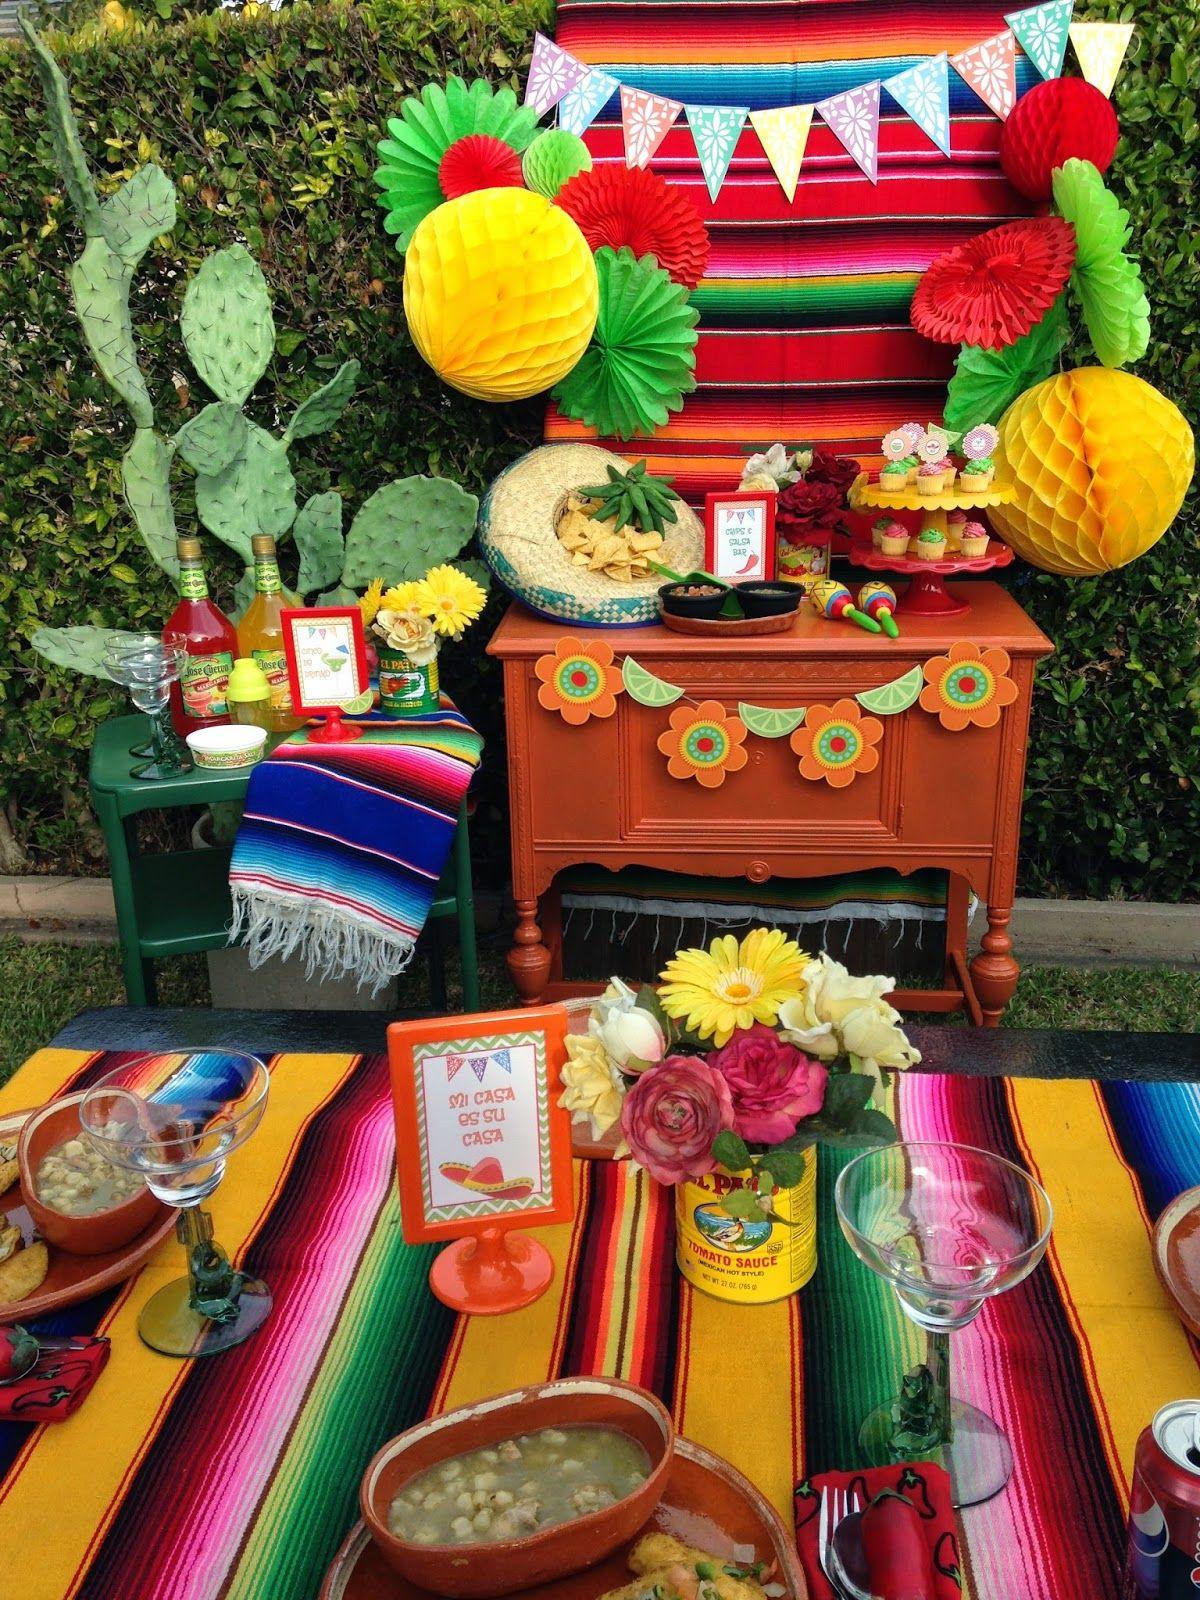 Fiesta candy mexicano pinterest fiestas fiesta mexicana y mexicanos for Decoracion kermes mexicana